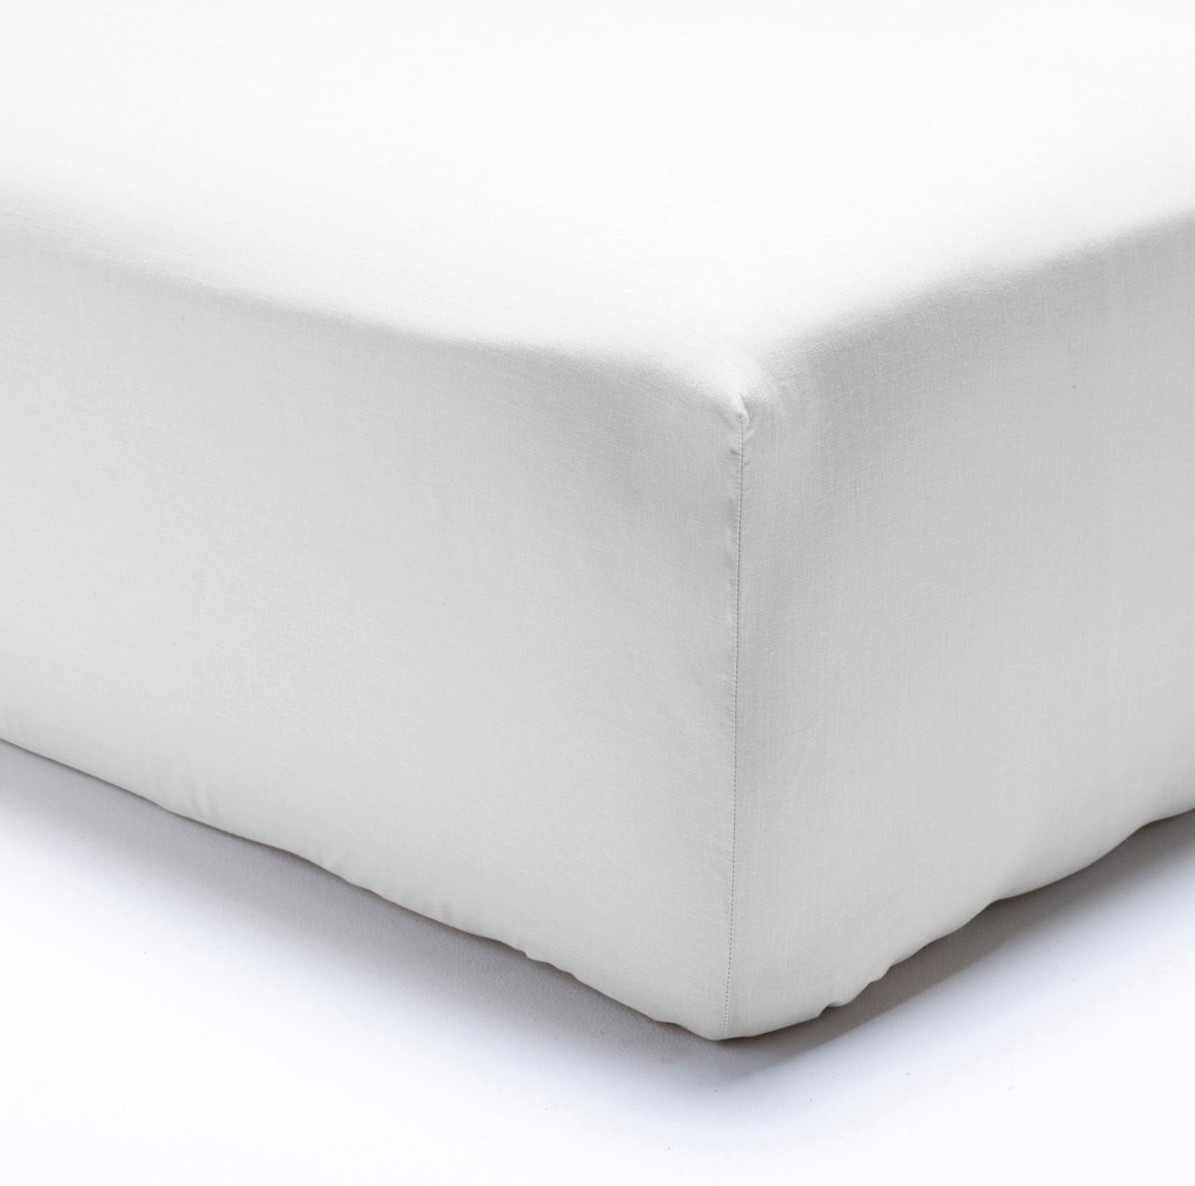 Polášek jersey prostěradlo 140x200cm, bílé